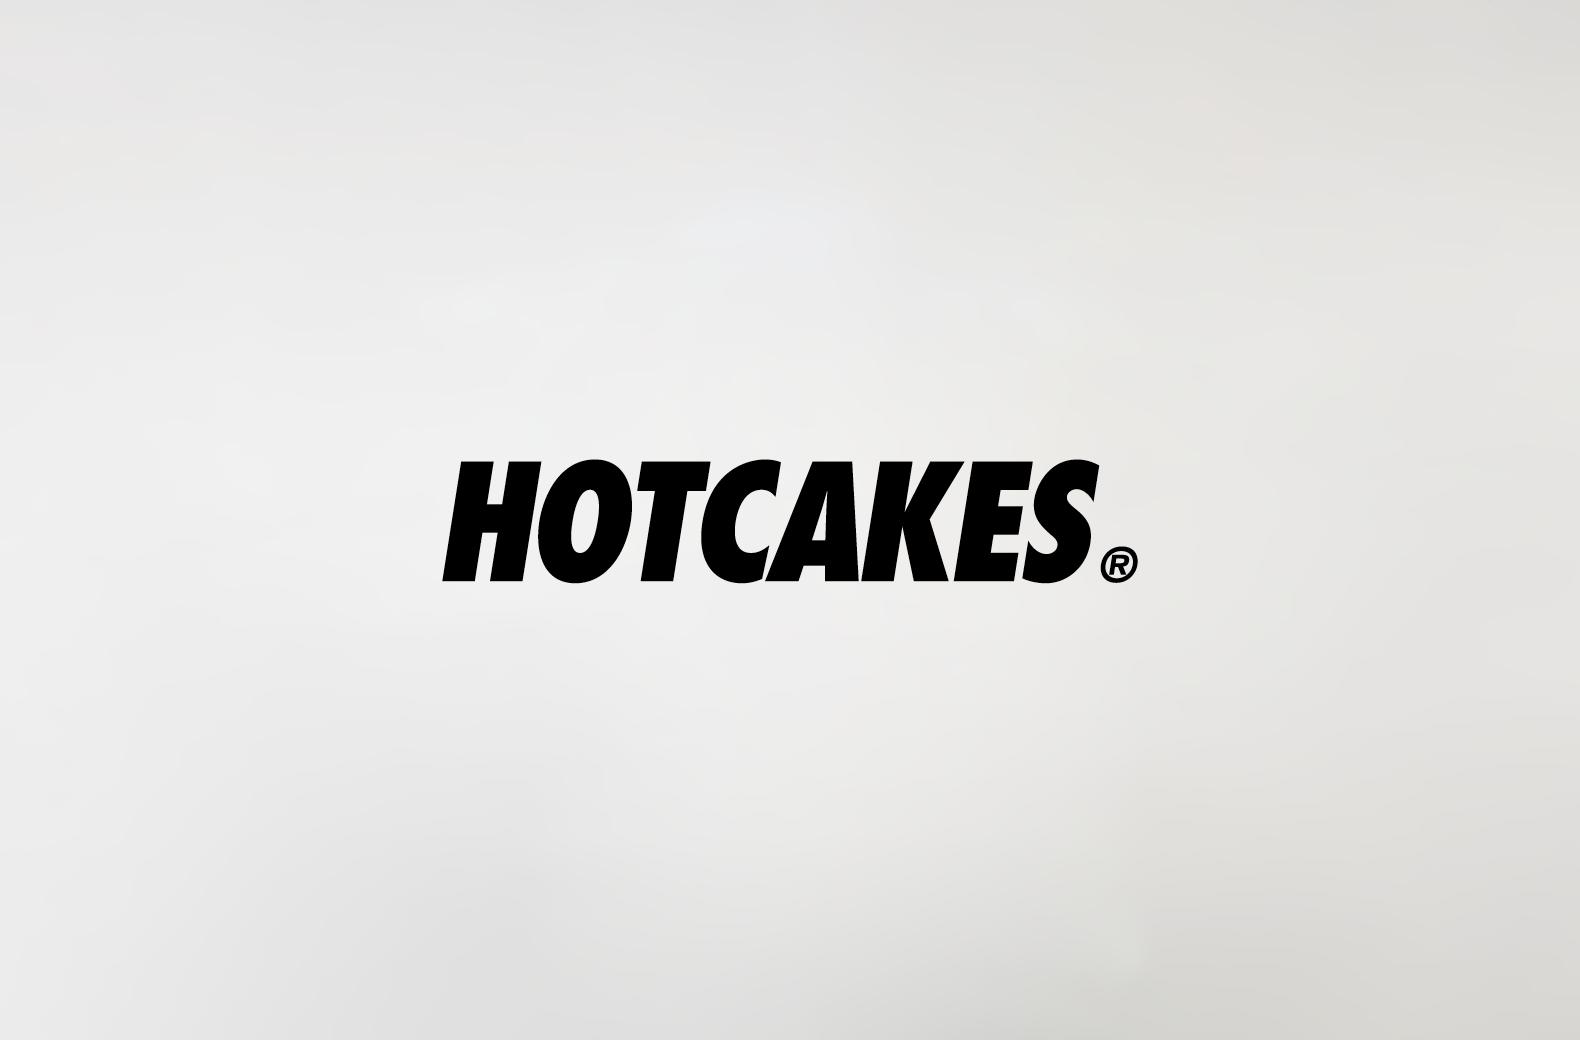 hotcakes_logo.jpg